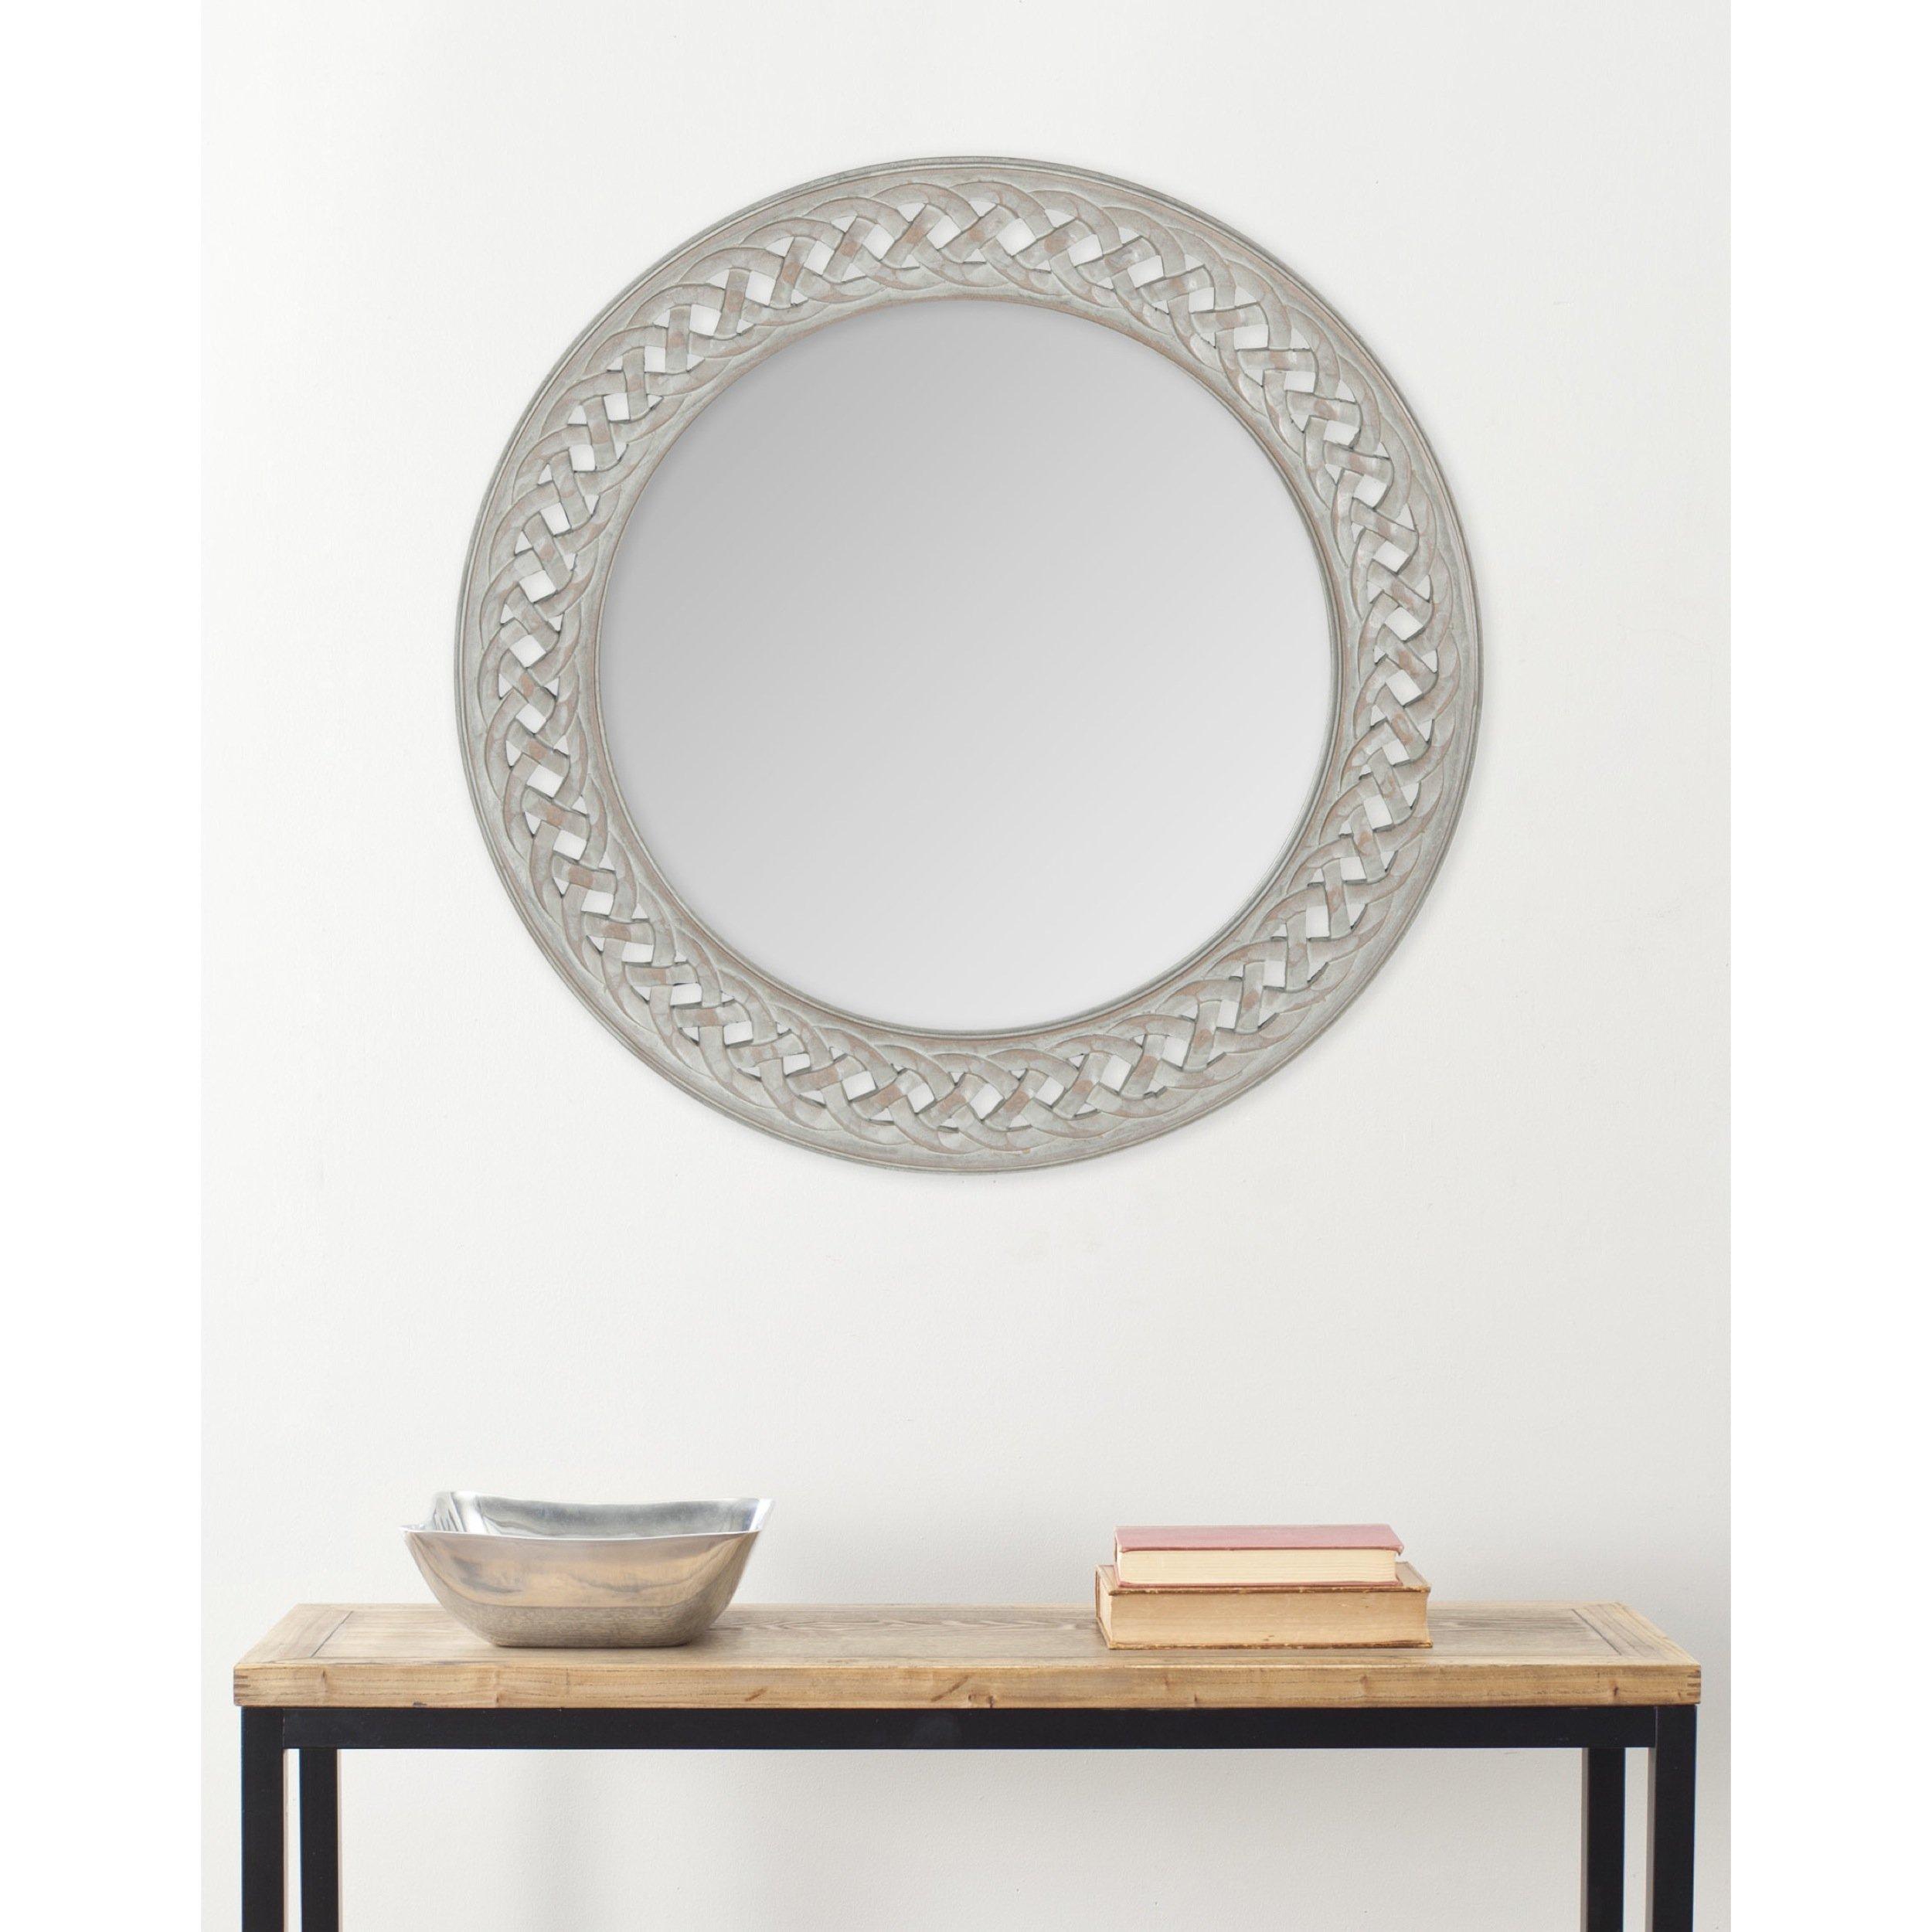 Safavieh Home Collection Braided Chain Mirror, Grey